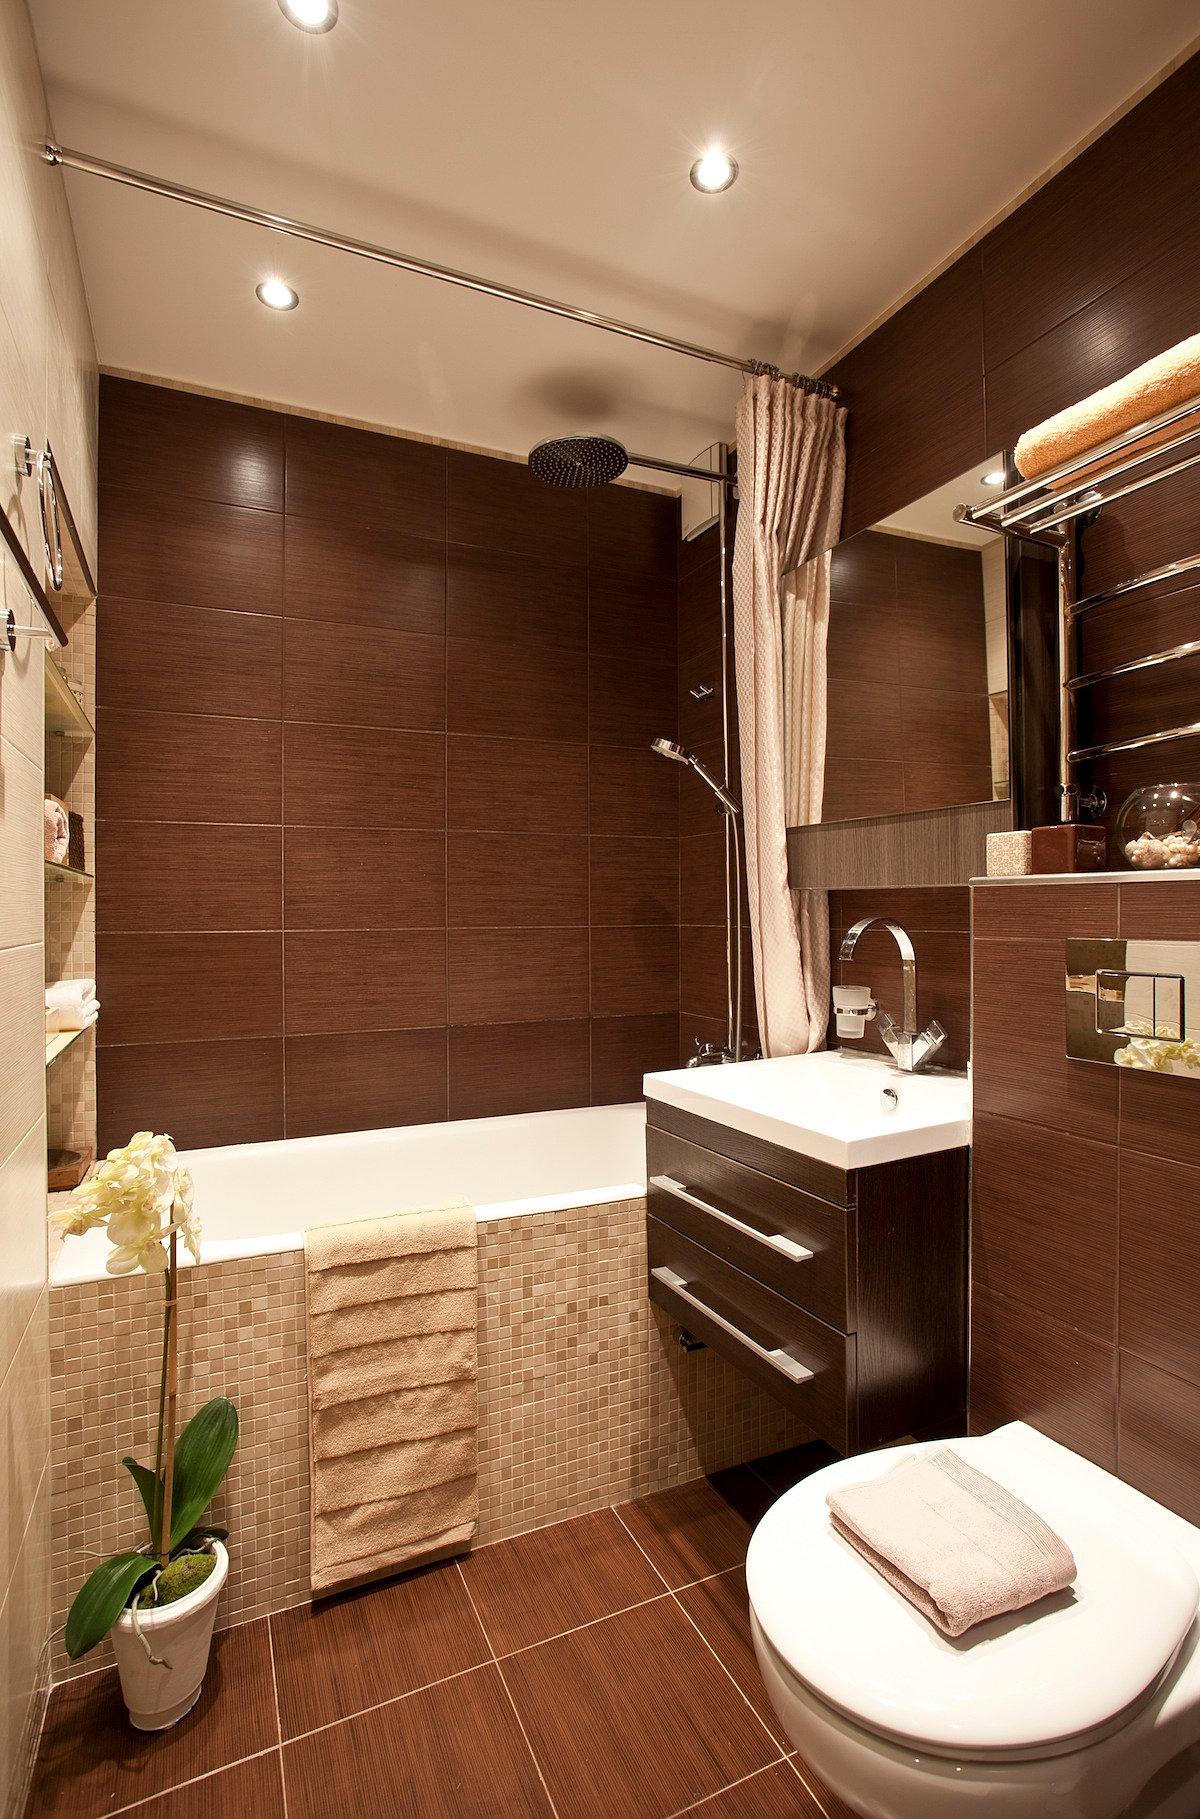 Фото интерьеров квартир интерьер ванных комнат 15 фотография